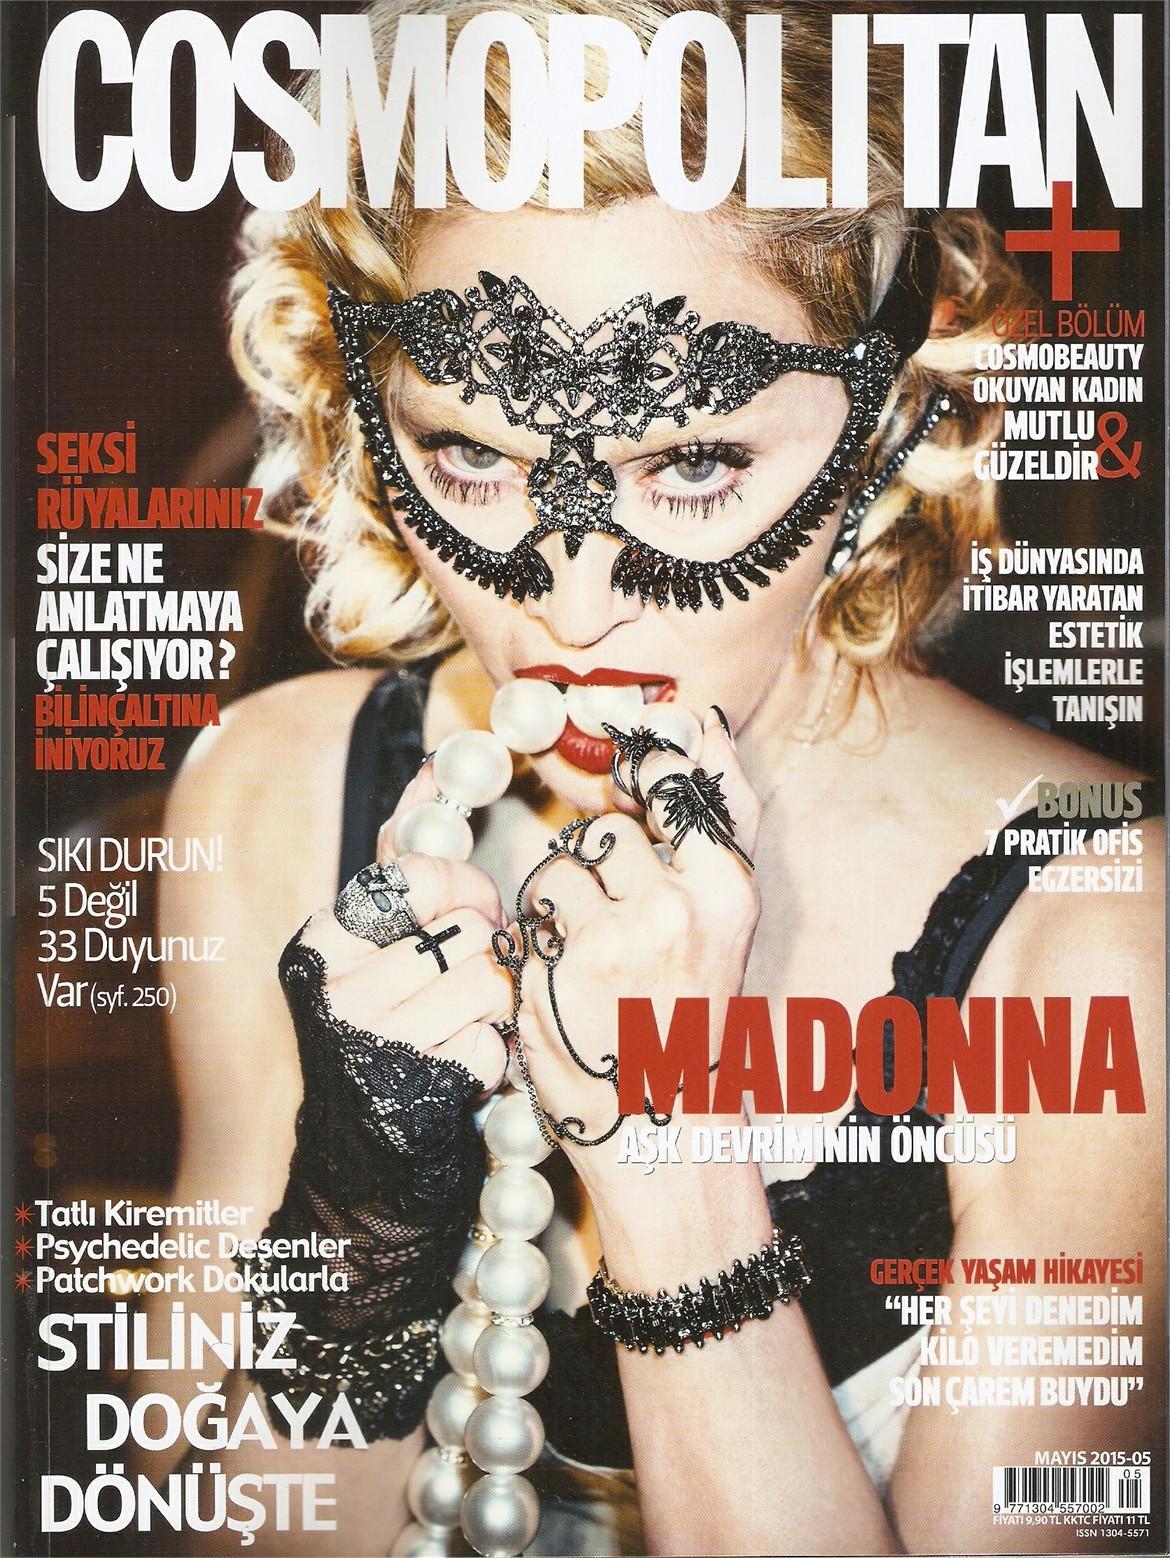 Cosmopolitan (hungarian edition / may 2015) madonnaunderground.